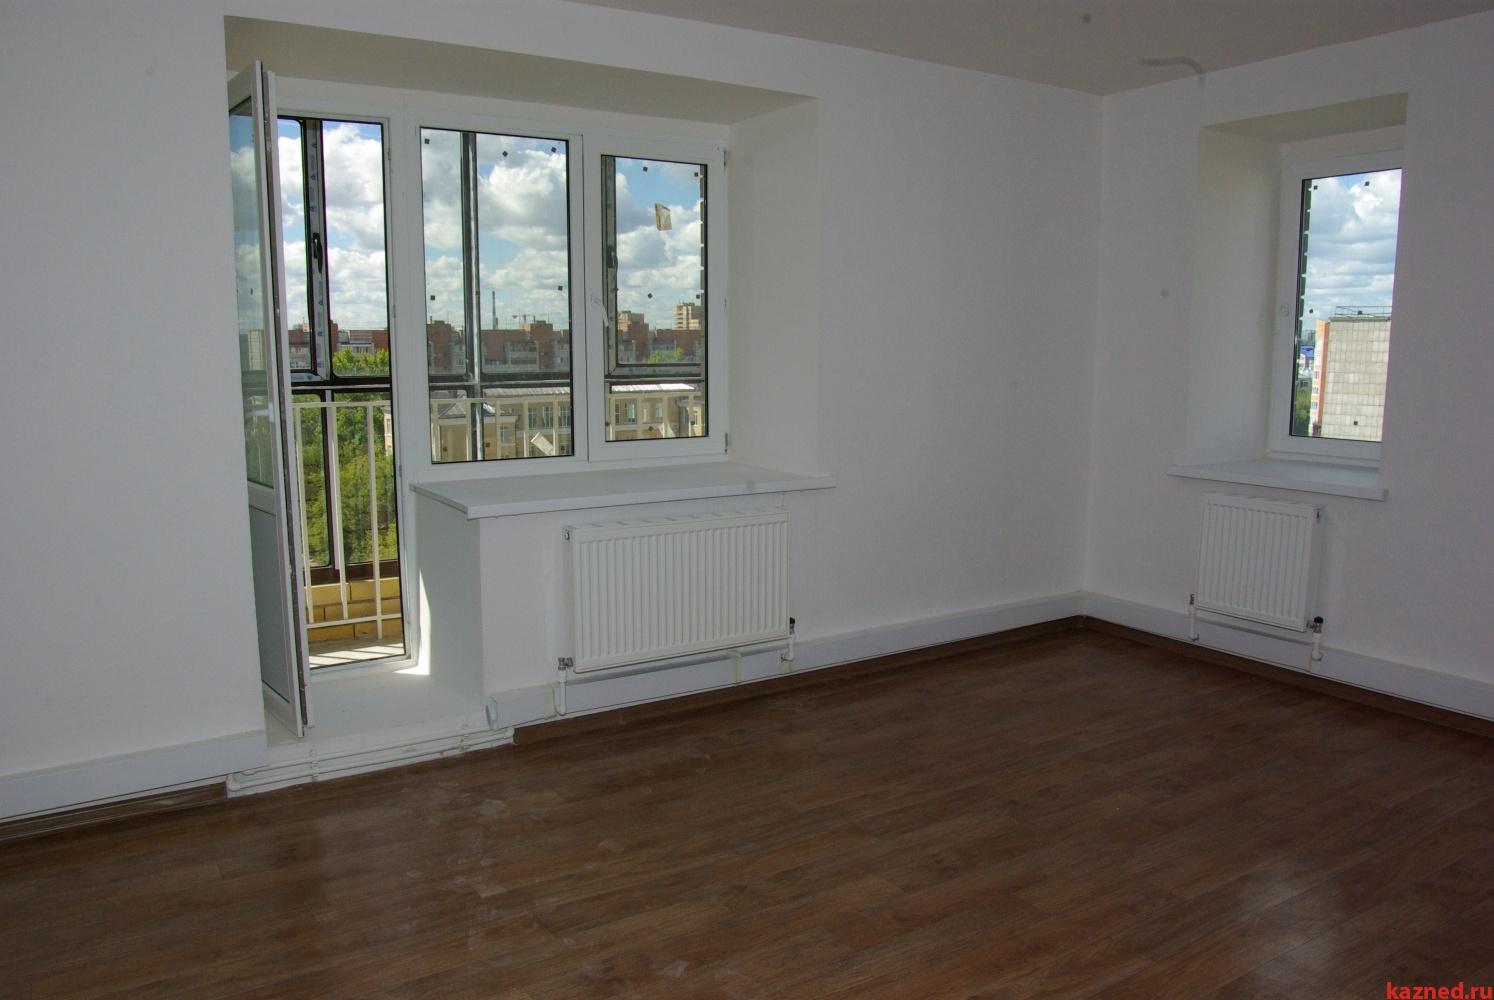 Продажа 3-к квартиры Лукина д.52, 80 м² (миниатюра №4)